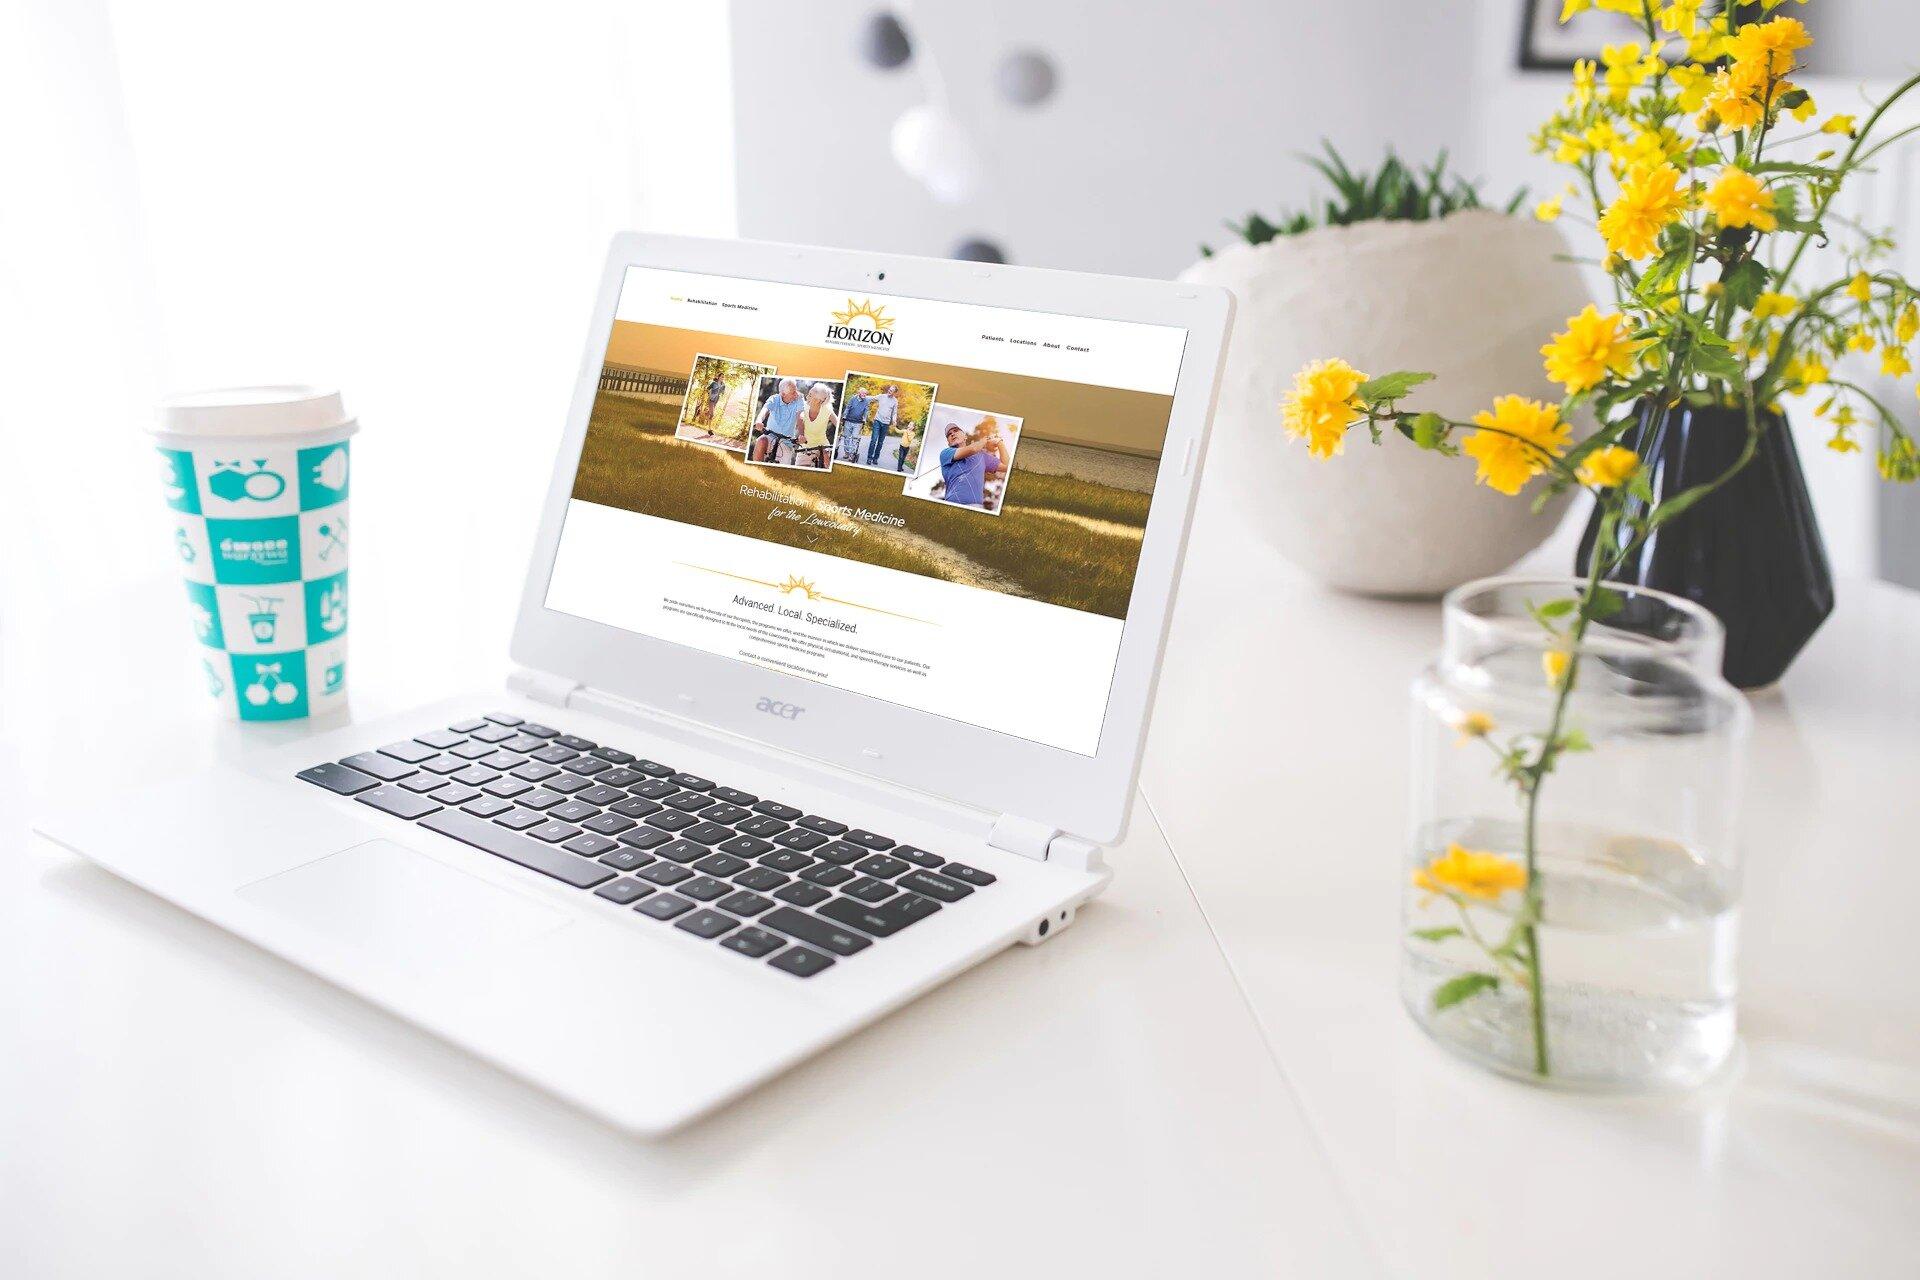 mockup-laptop-3.jpg